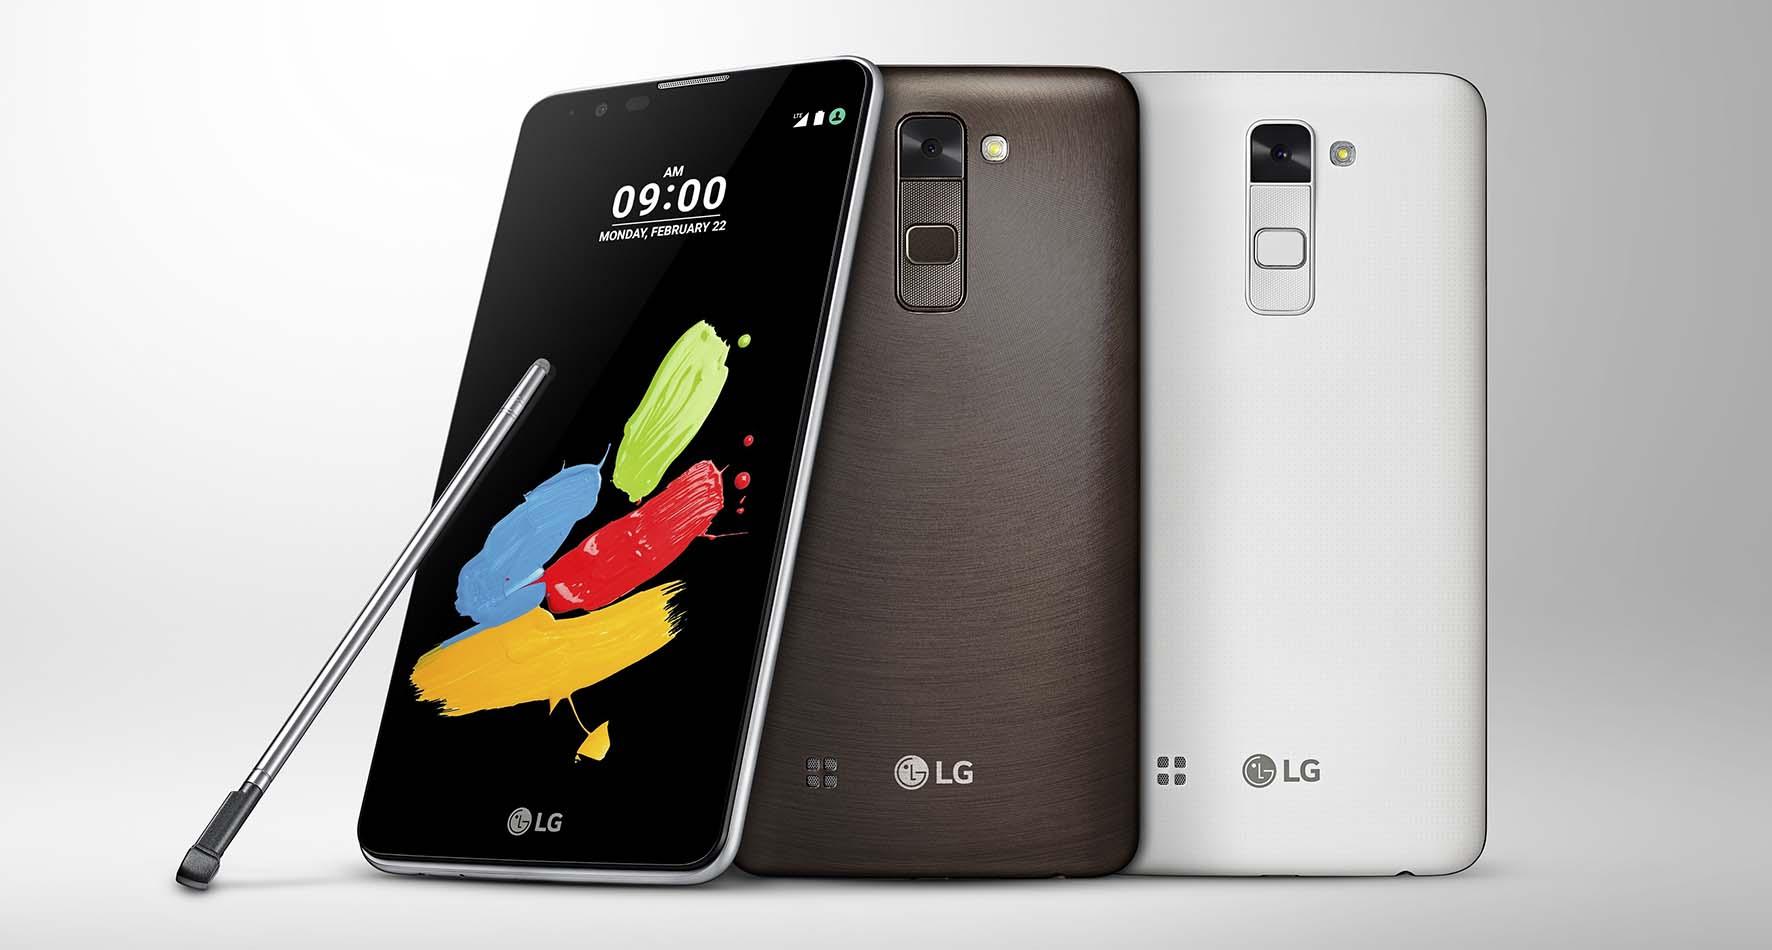 LG 2016 Stylus 2 telefono con sintonizzatore DAB